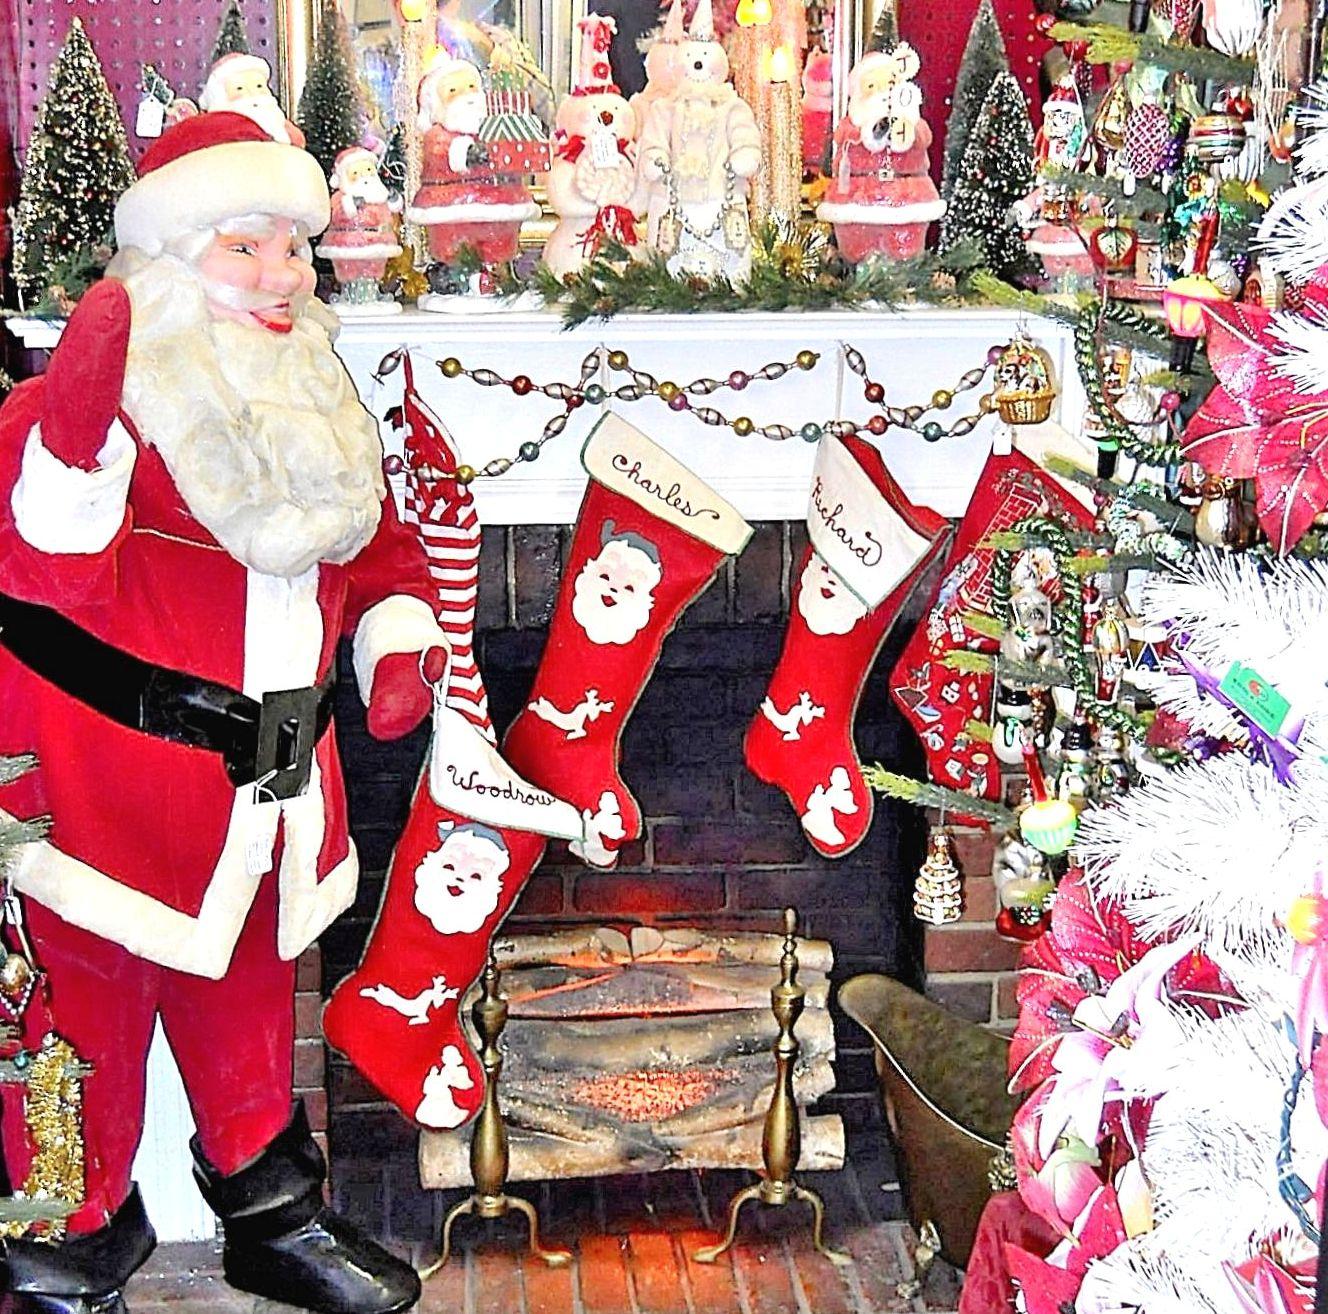 Nostalgic Christmas Decorations: CHRISTMAS NOSTALGIA Vintage Christmas Antique Ornaments